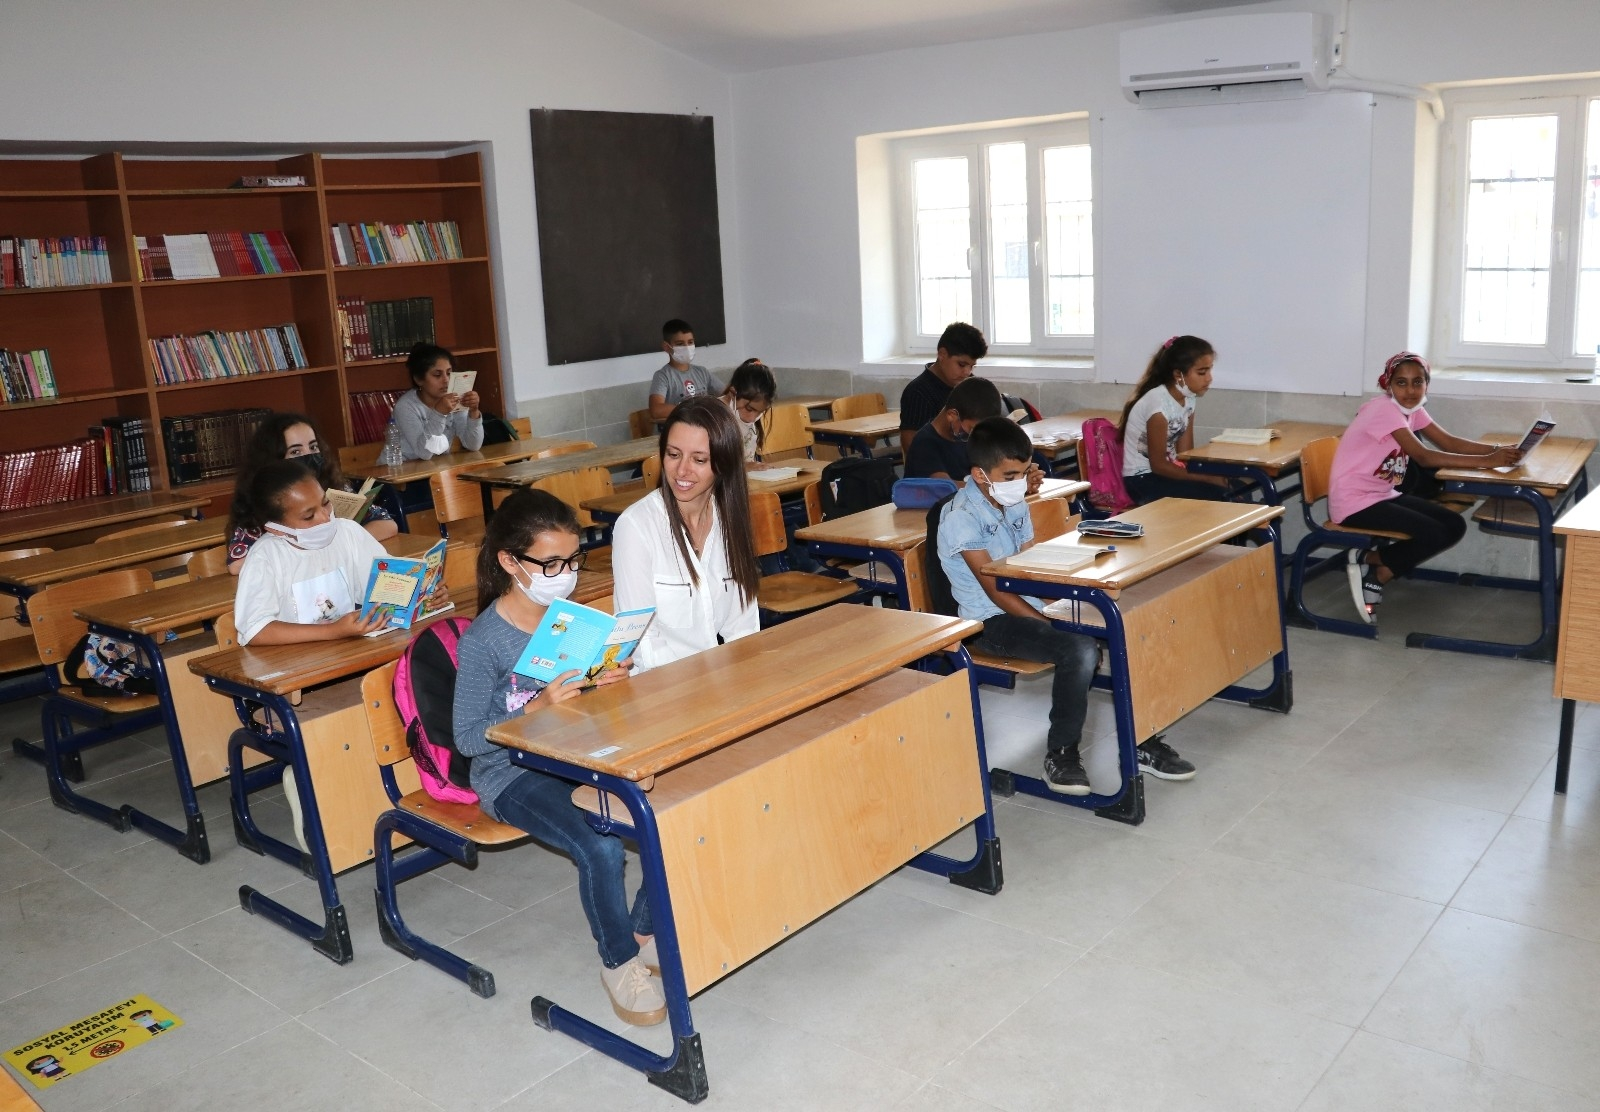 2021/06/okul-mudiresi-atandigi-harabe-koy-okuluna-adeta-hayat-verdi-20210610AW34-2.jpg